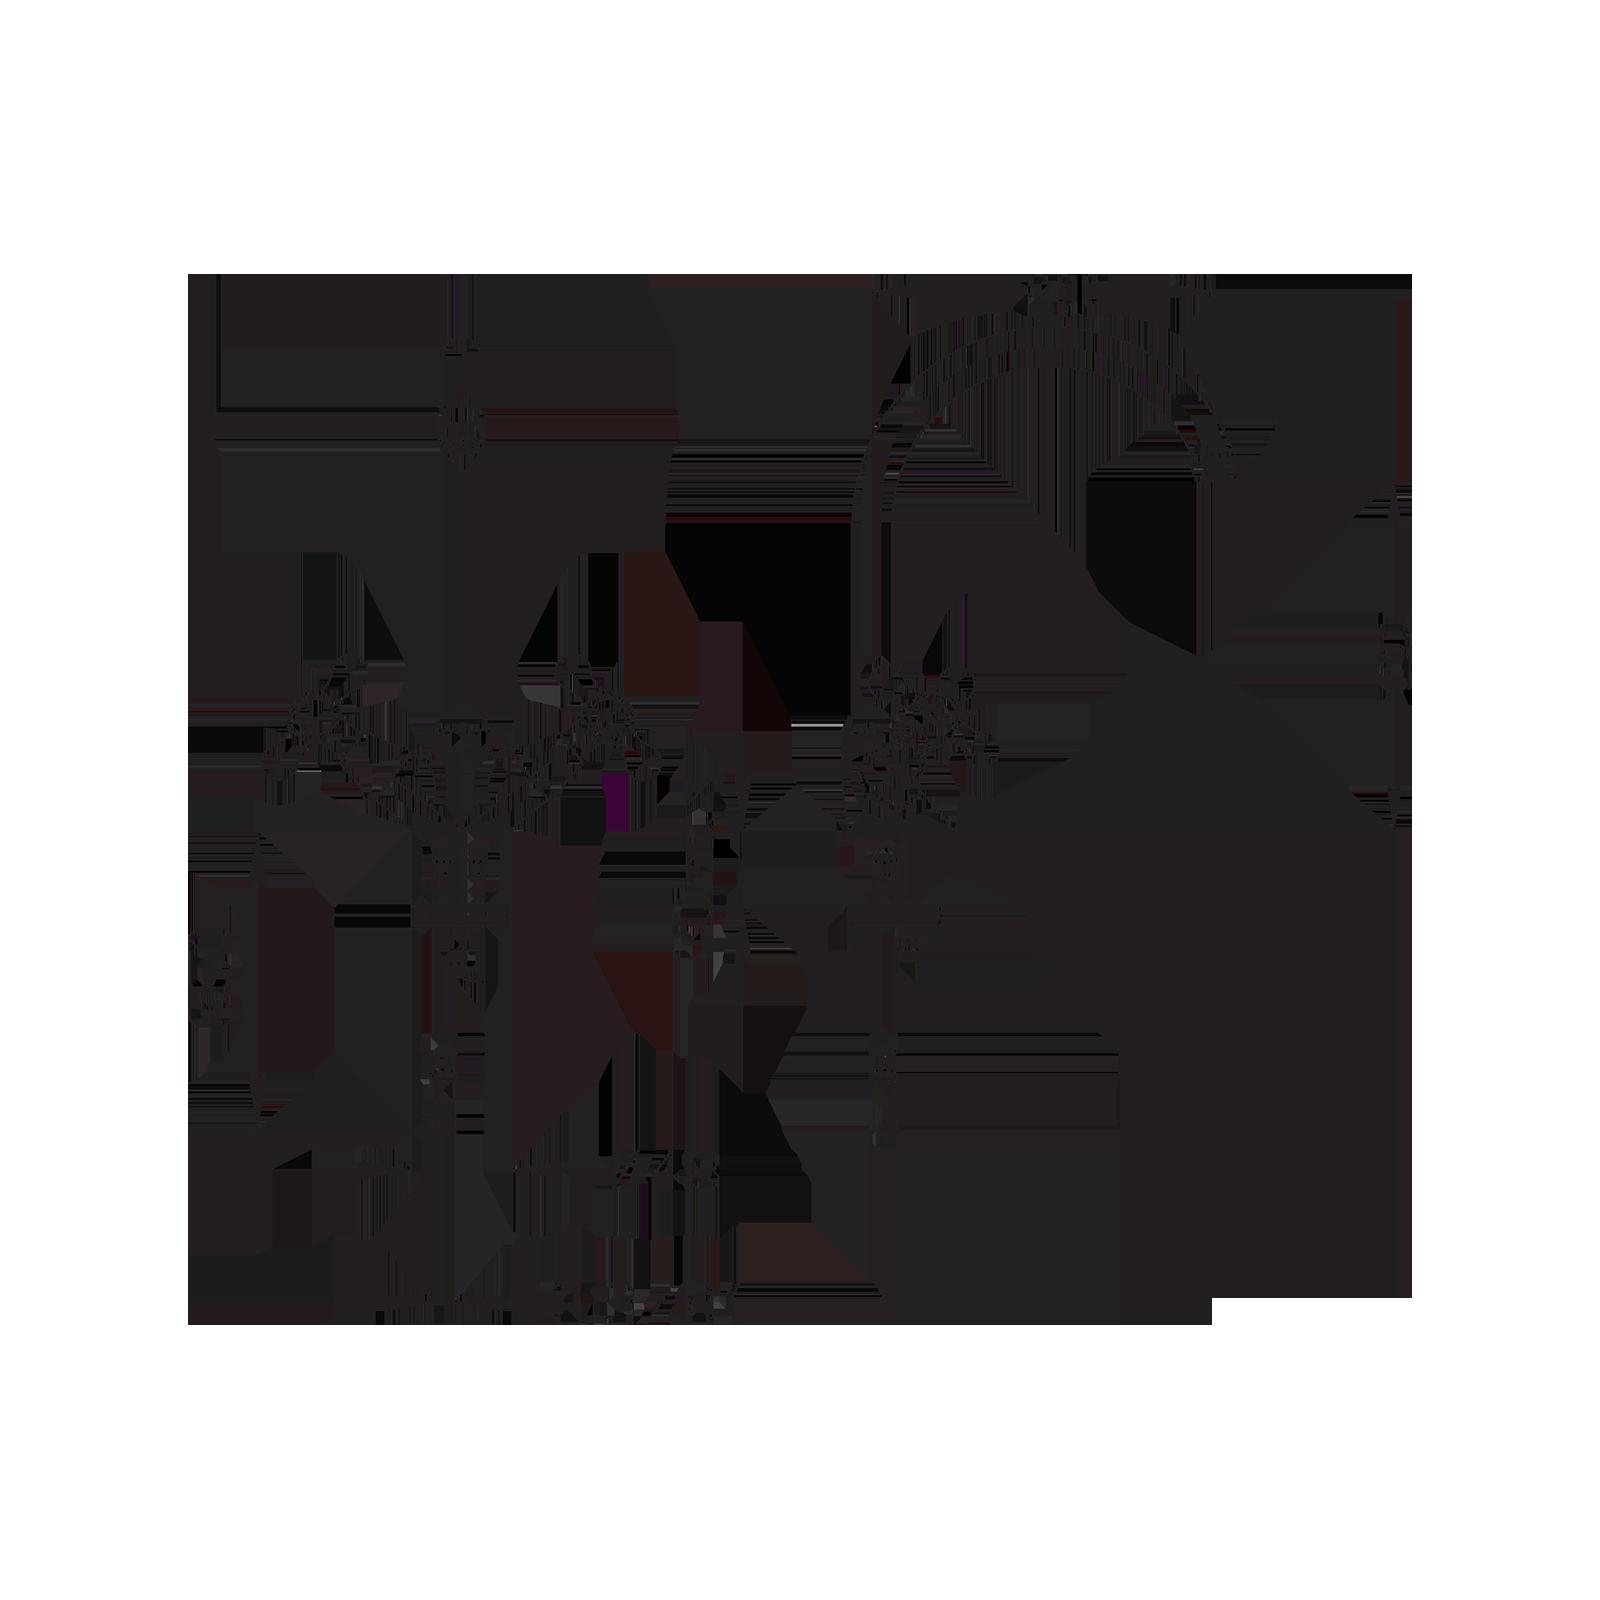 Single-hole sink unit with swivel P-spout